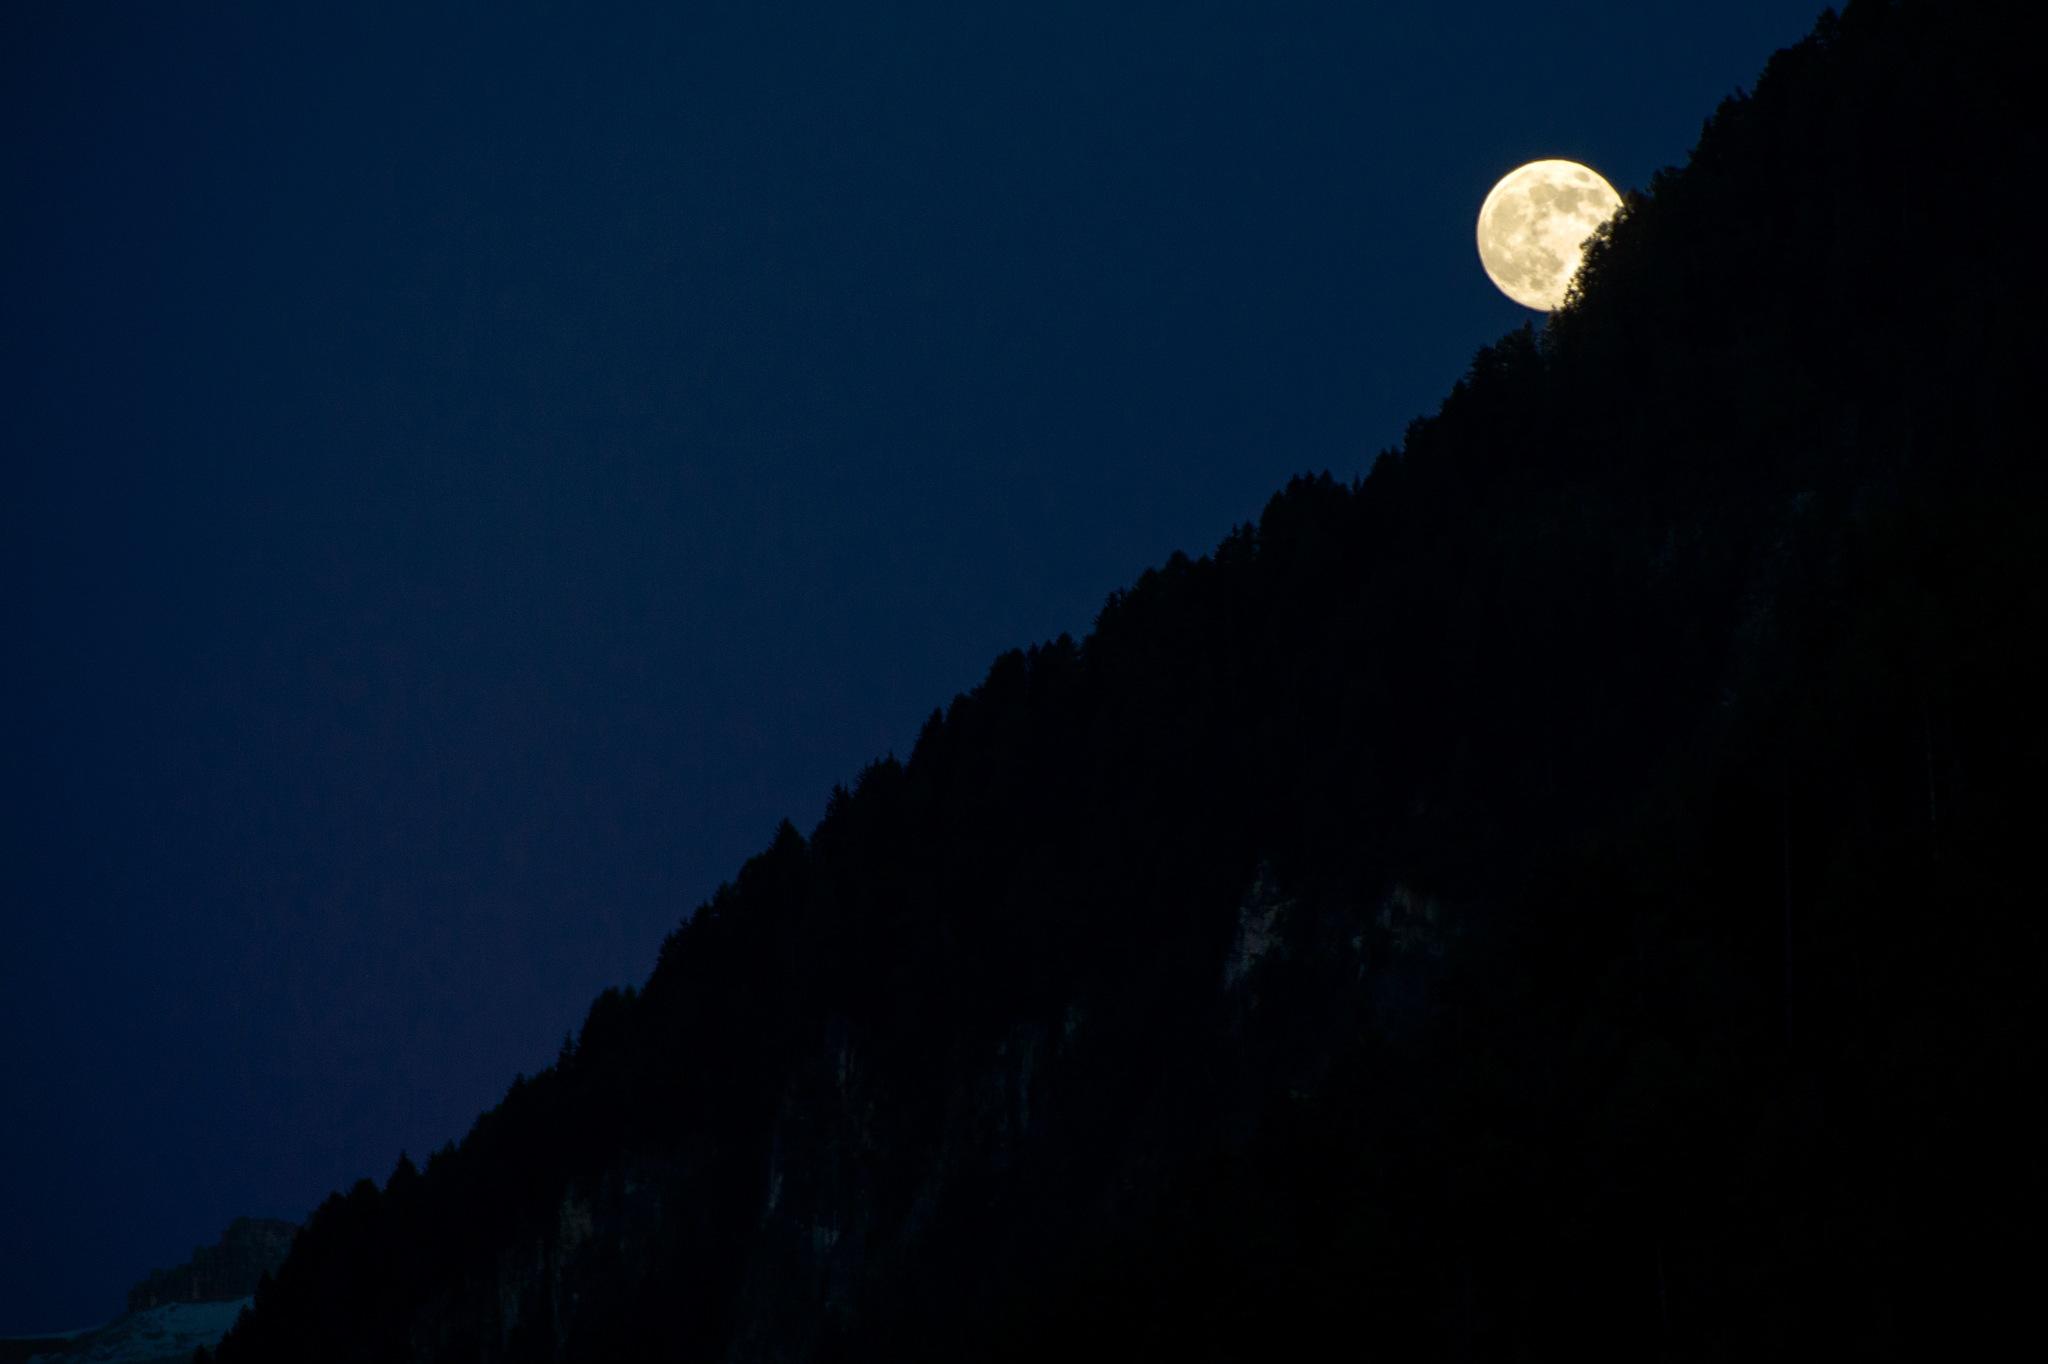 full moon by maurizio senoner